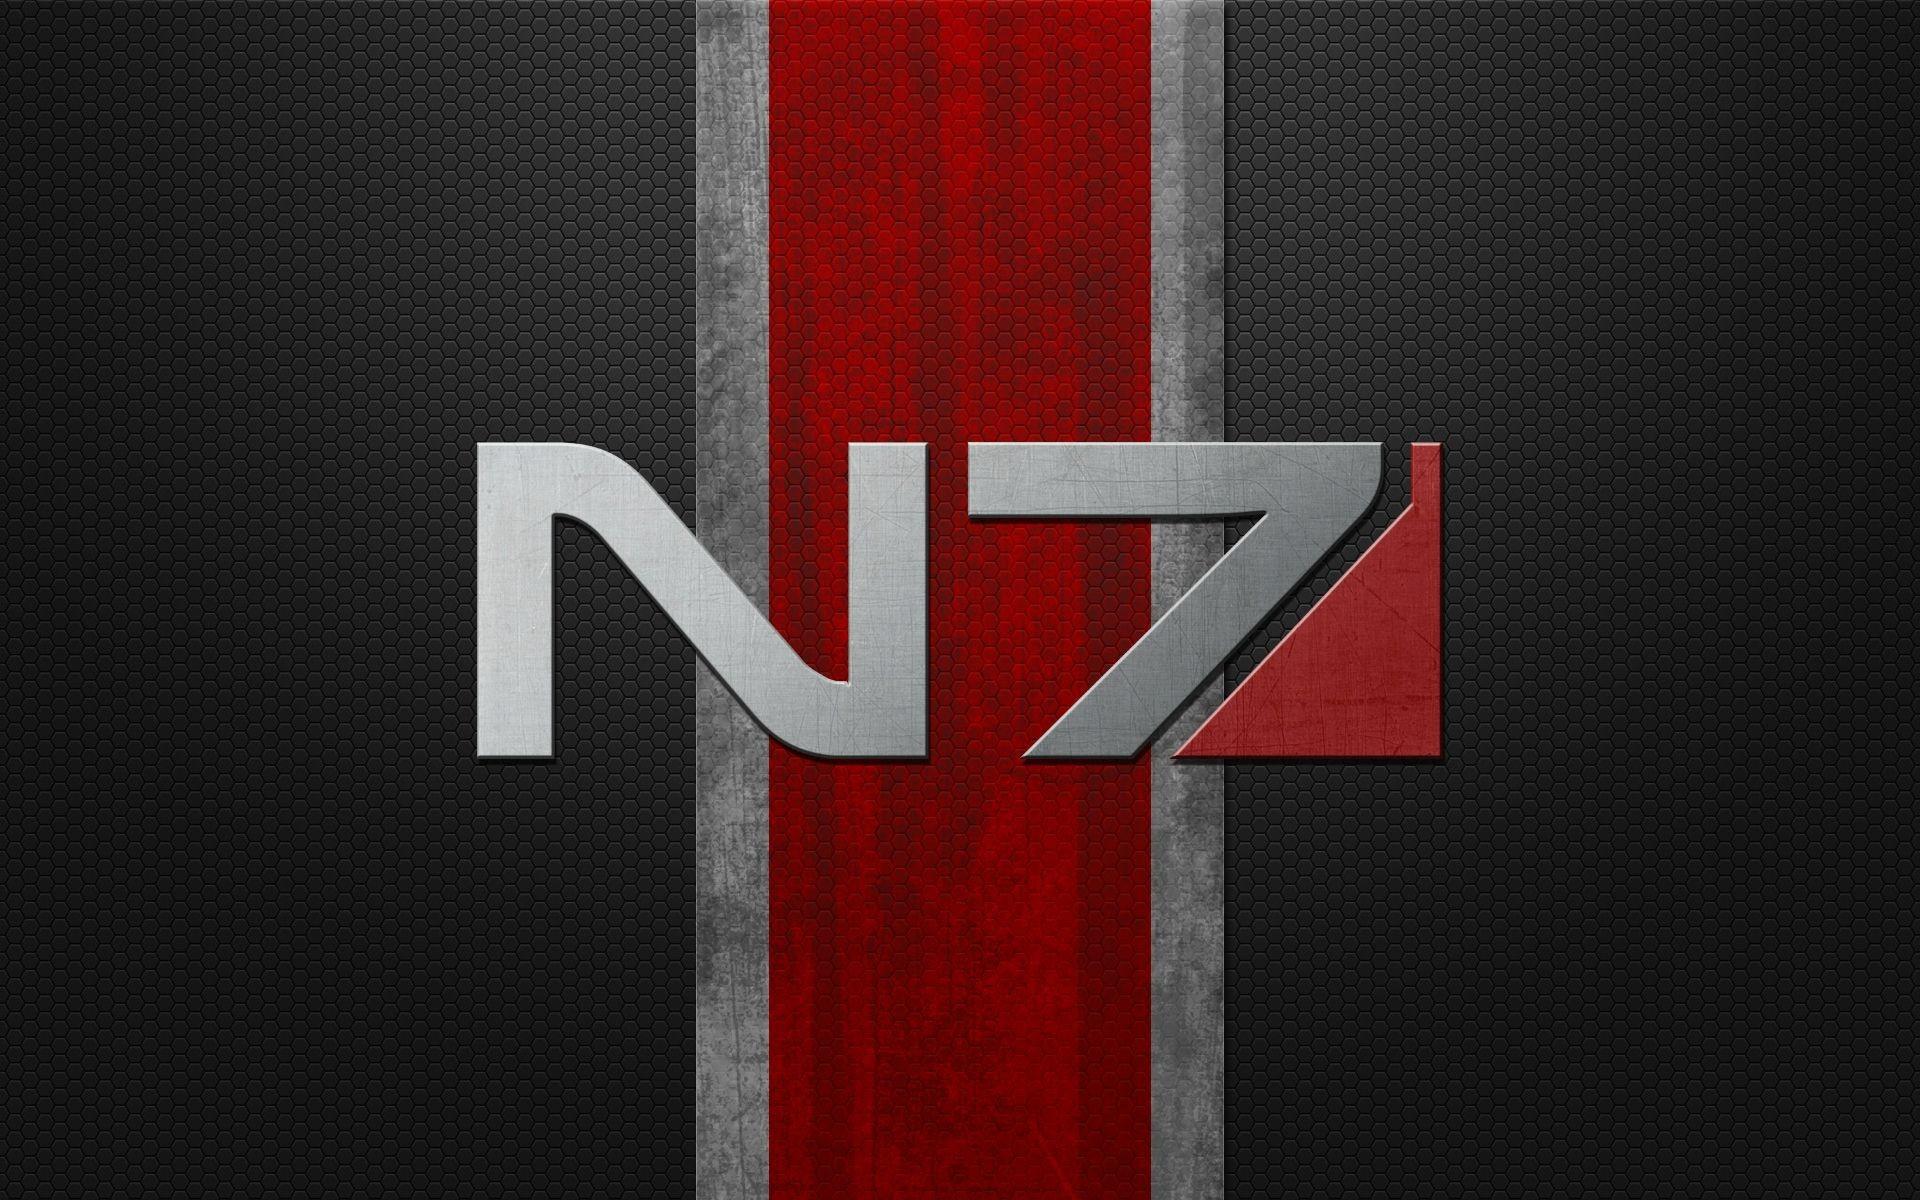 Mass Effect Hd обои фон 1920x1200 Id341854